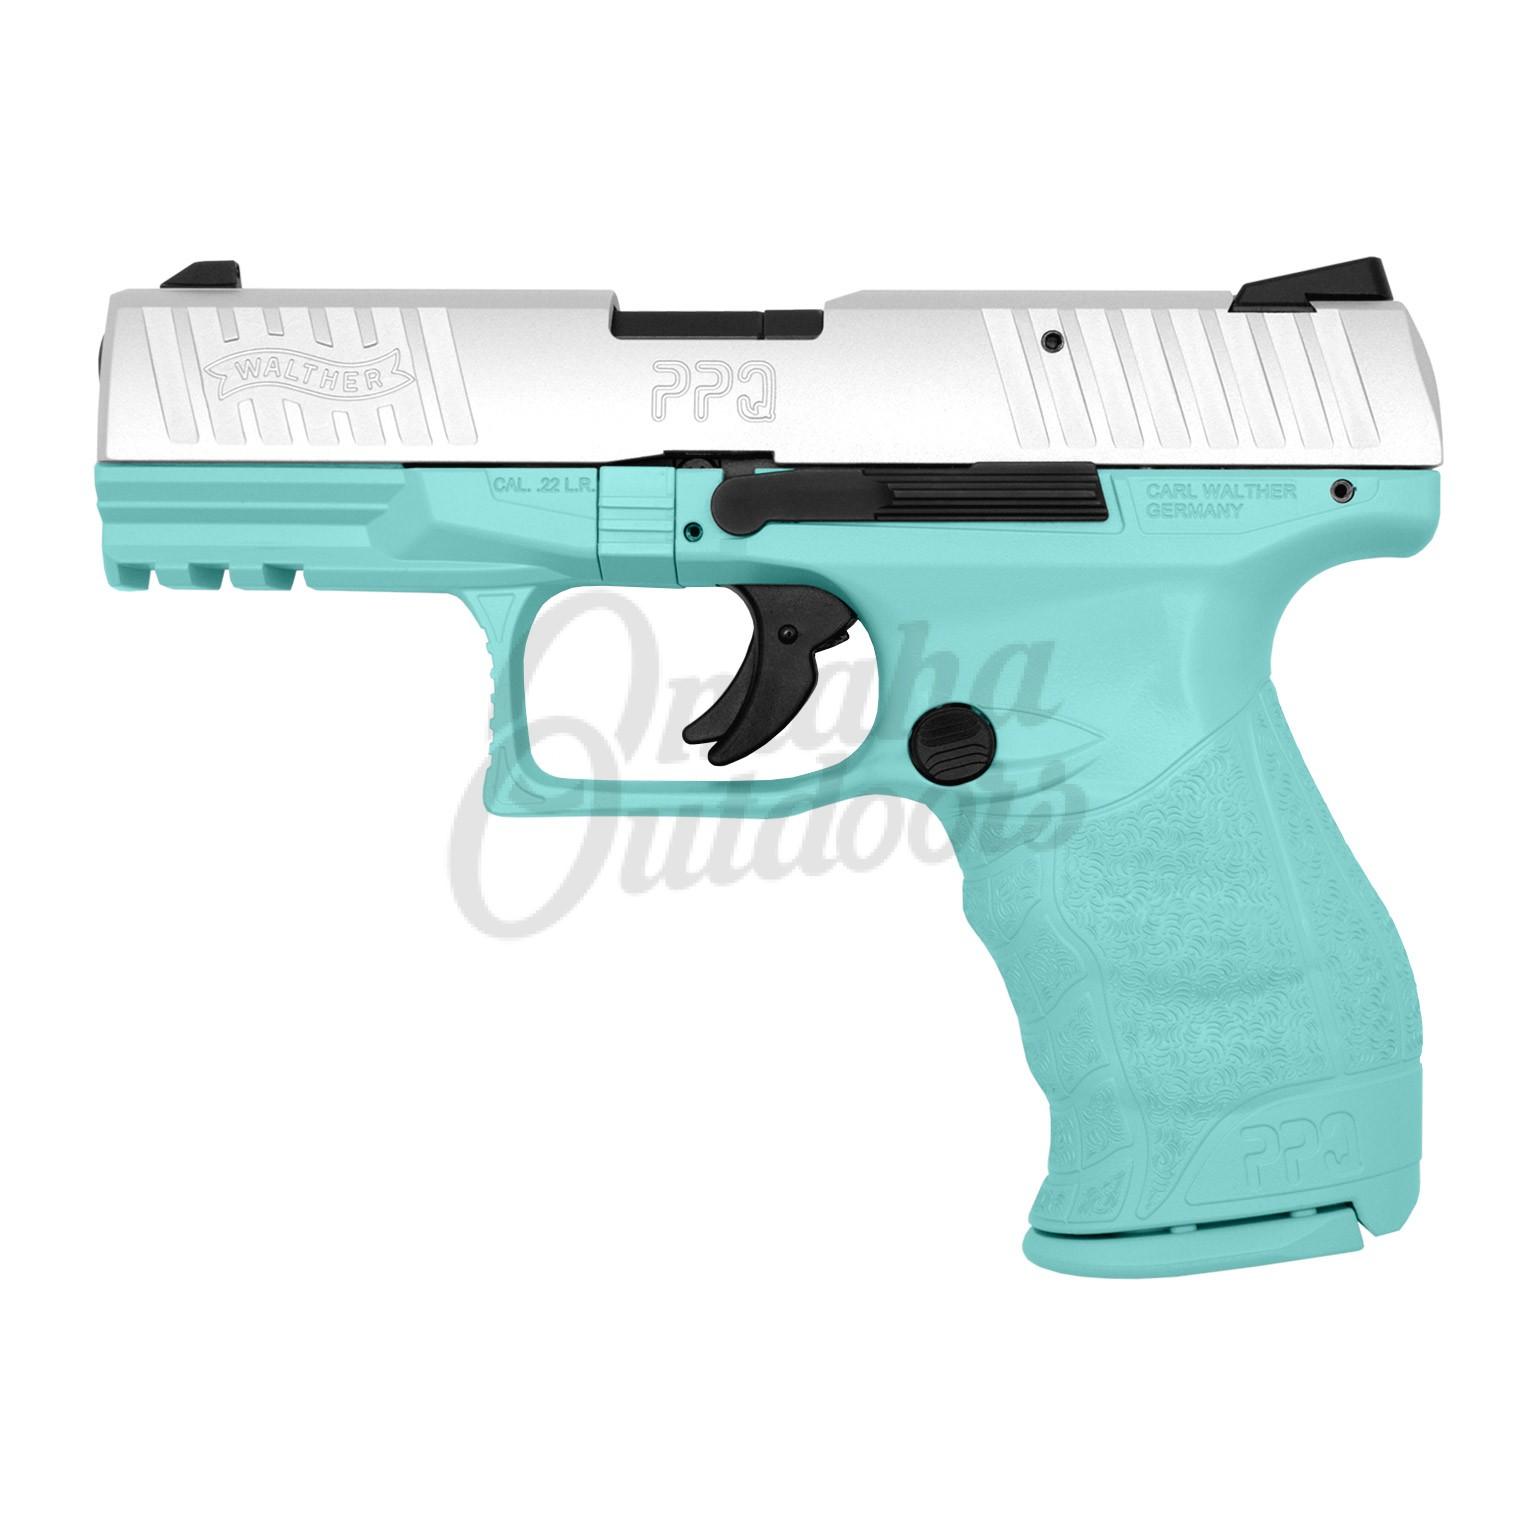 Walther Arms PPQ 22 Vera Blue Pistol 22 LR Satin Aluminum Slide 12 RD  5100300-VBL-FR-SAL-SL